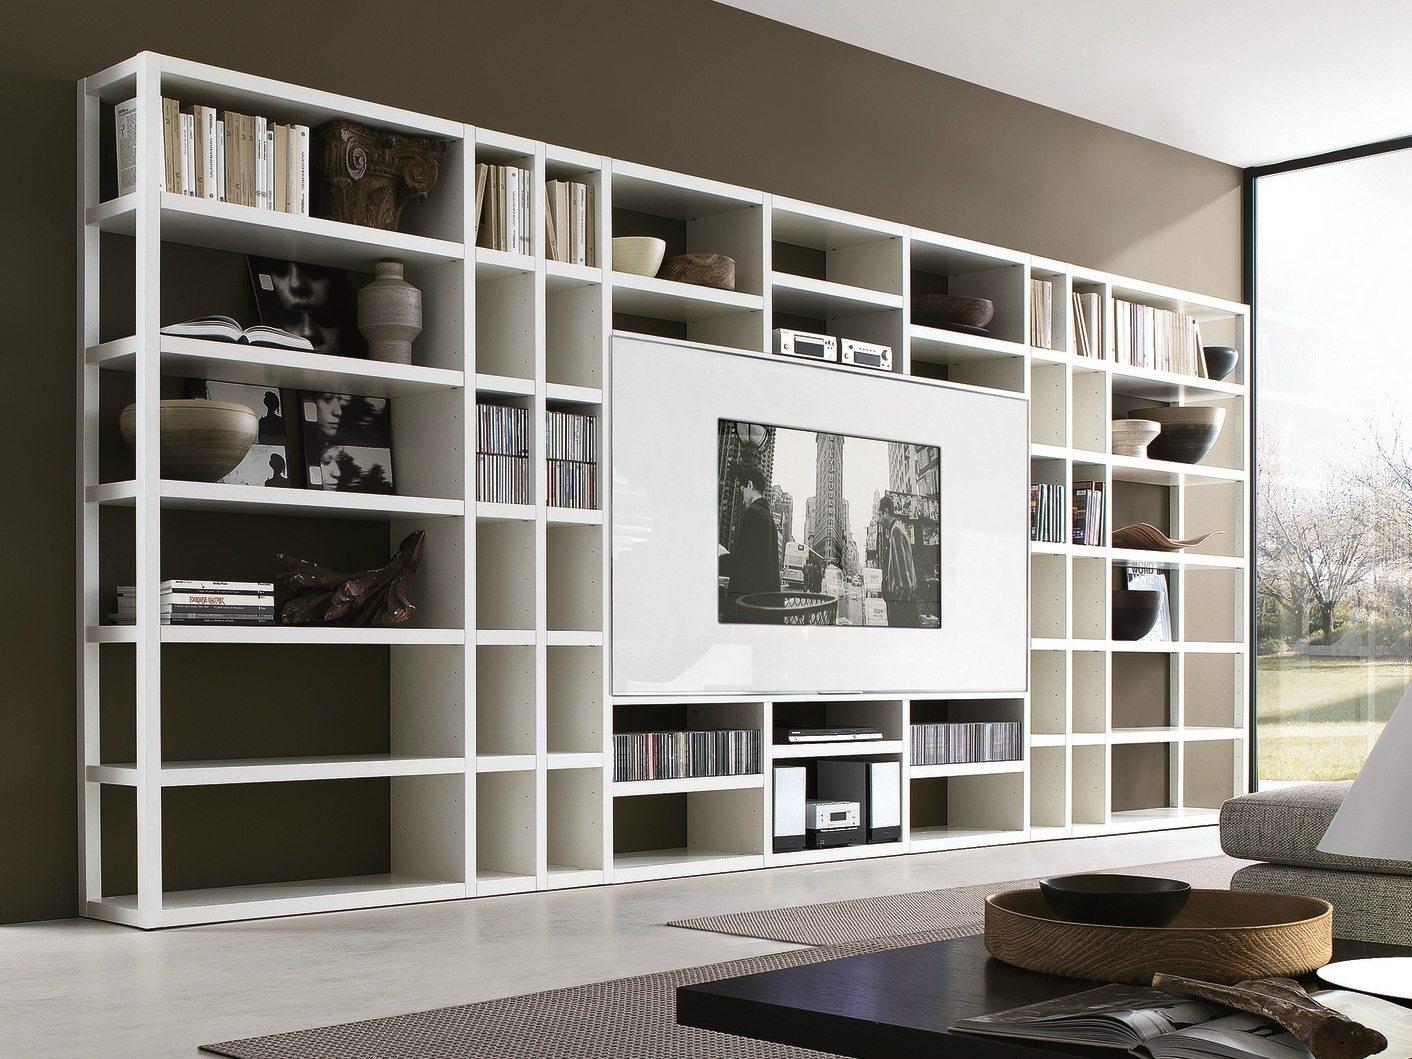 Tv Bookcase American Hwy Regarding Tv In Bookcase (#11 of 14)